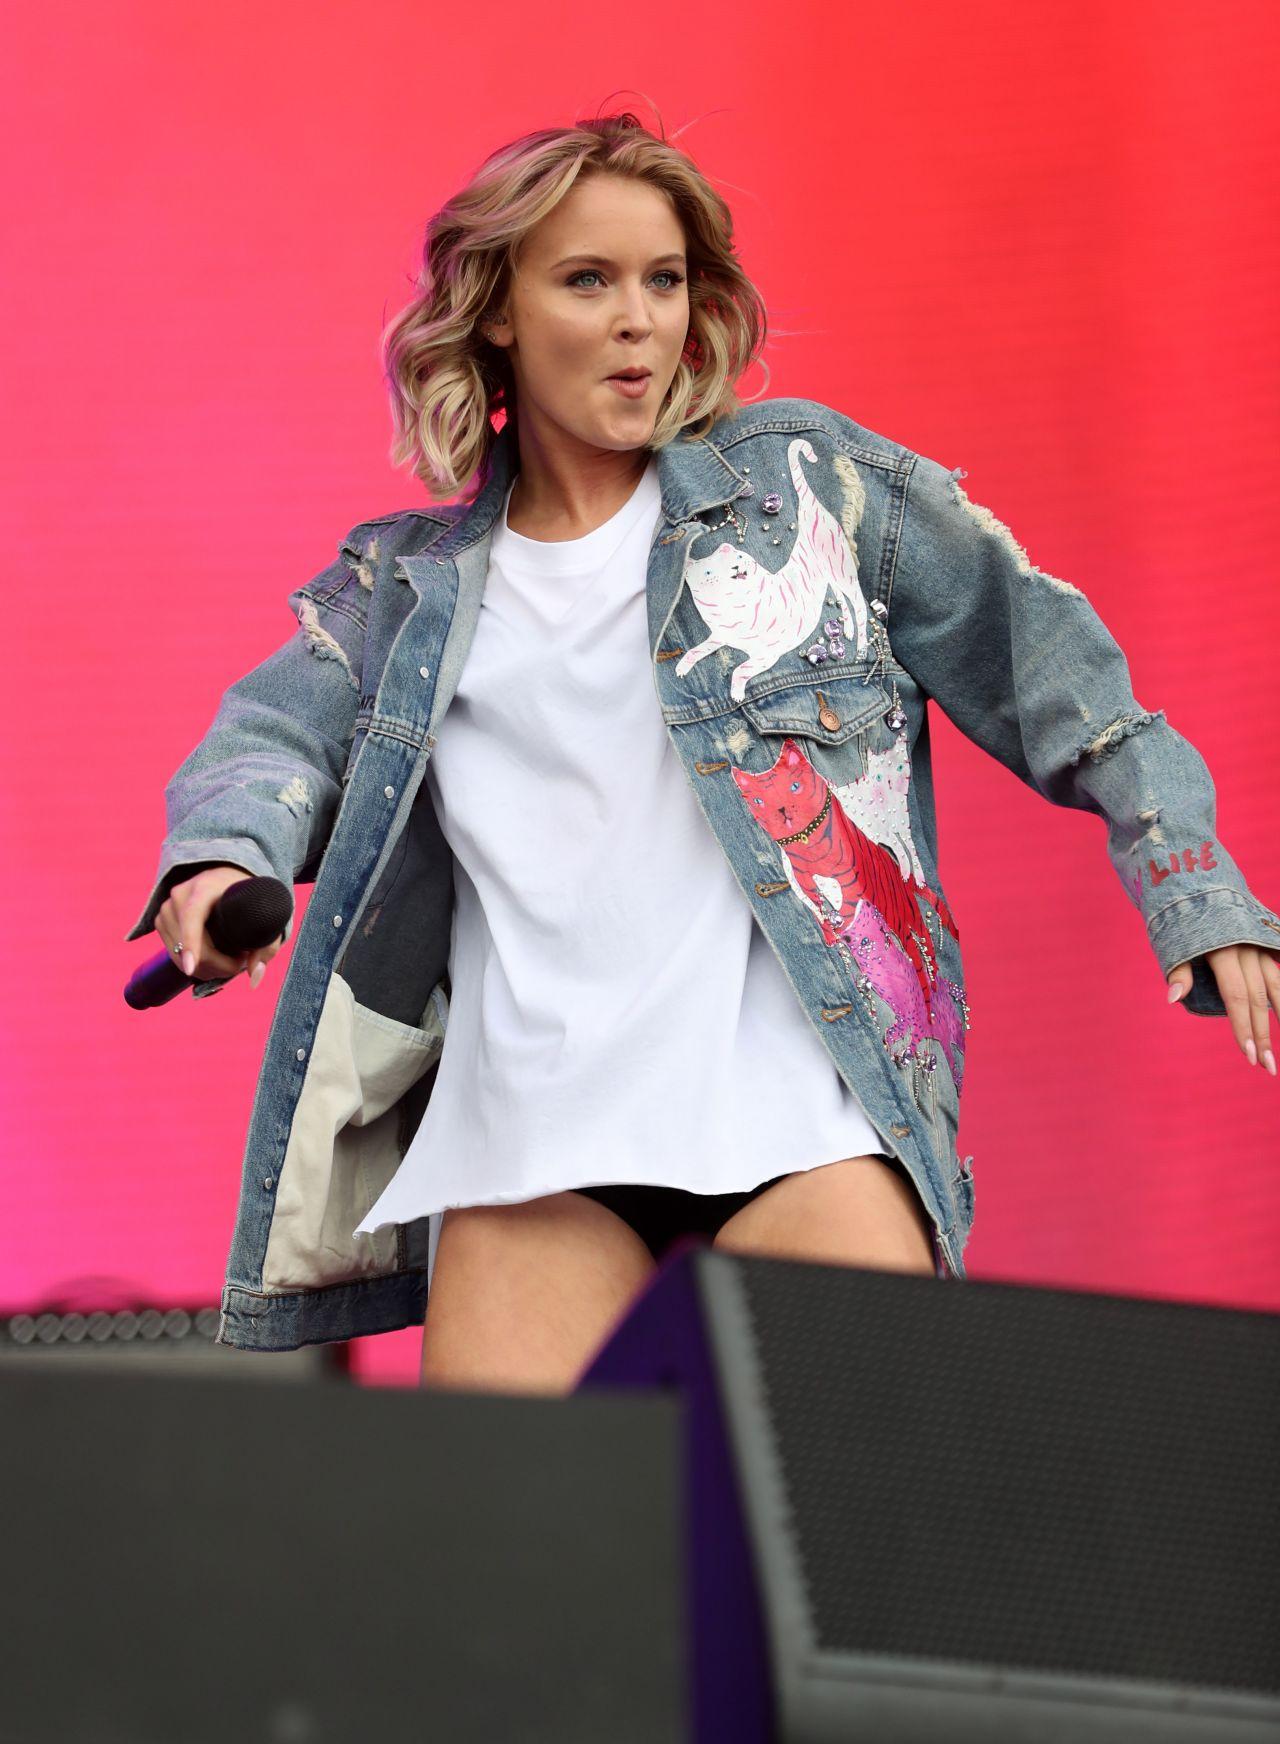 Zara Larsson Performs Live At Bbc Big Weekend In Burton